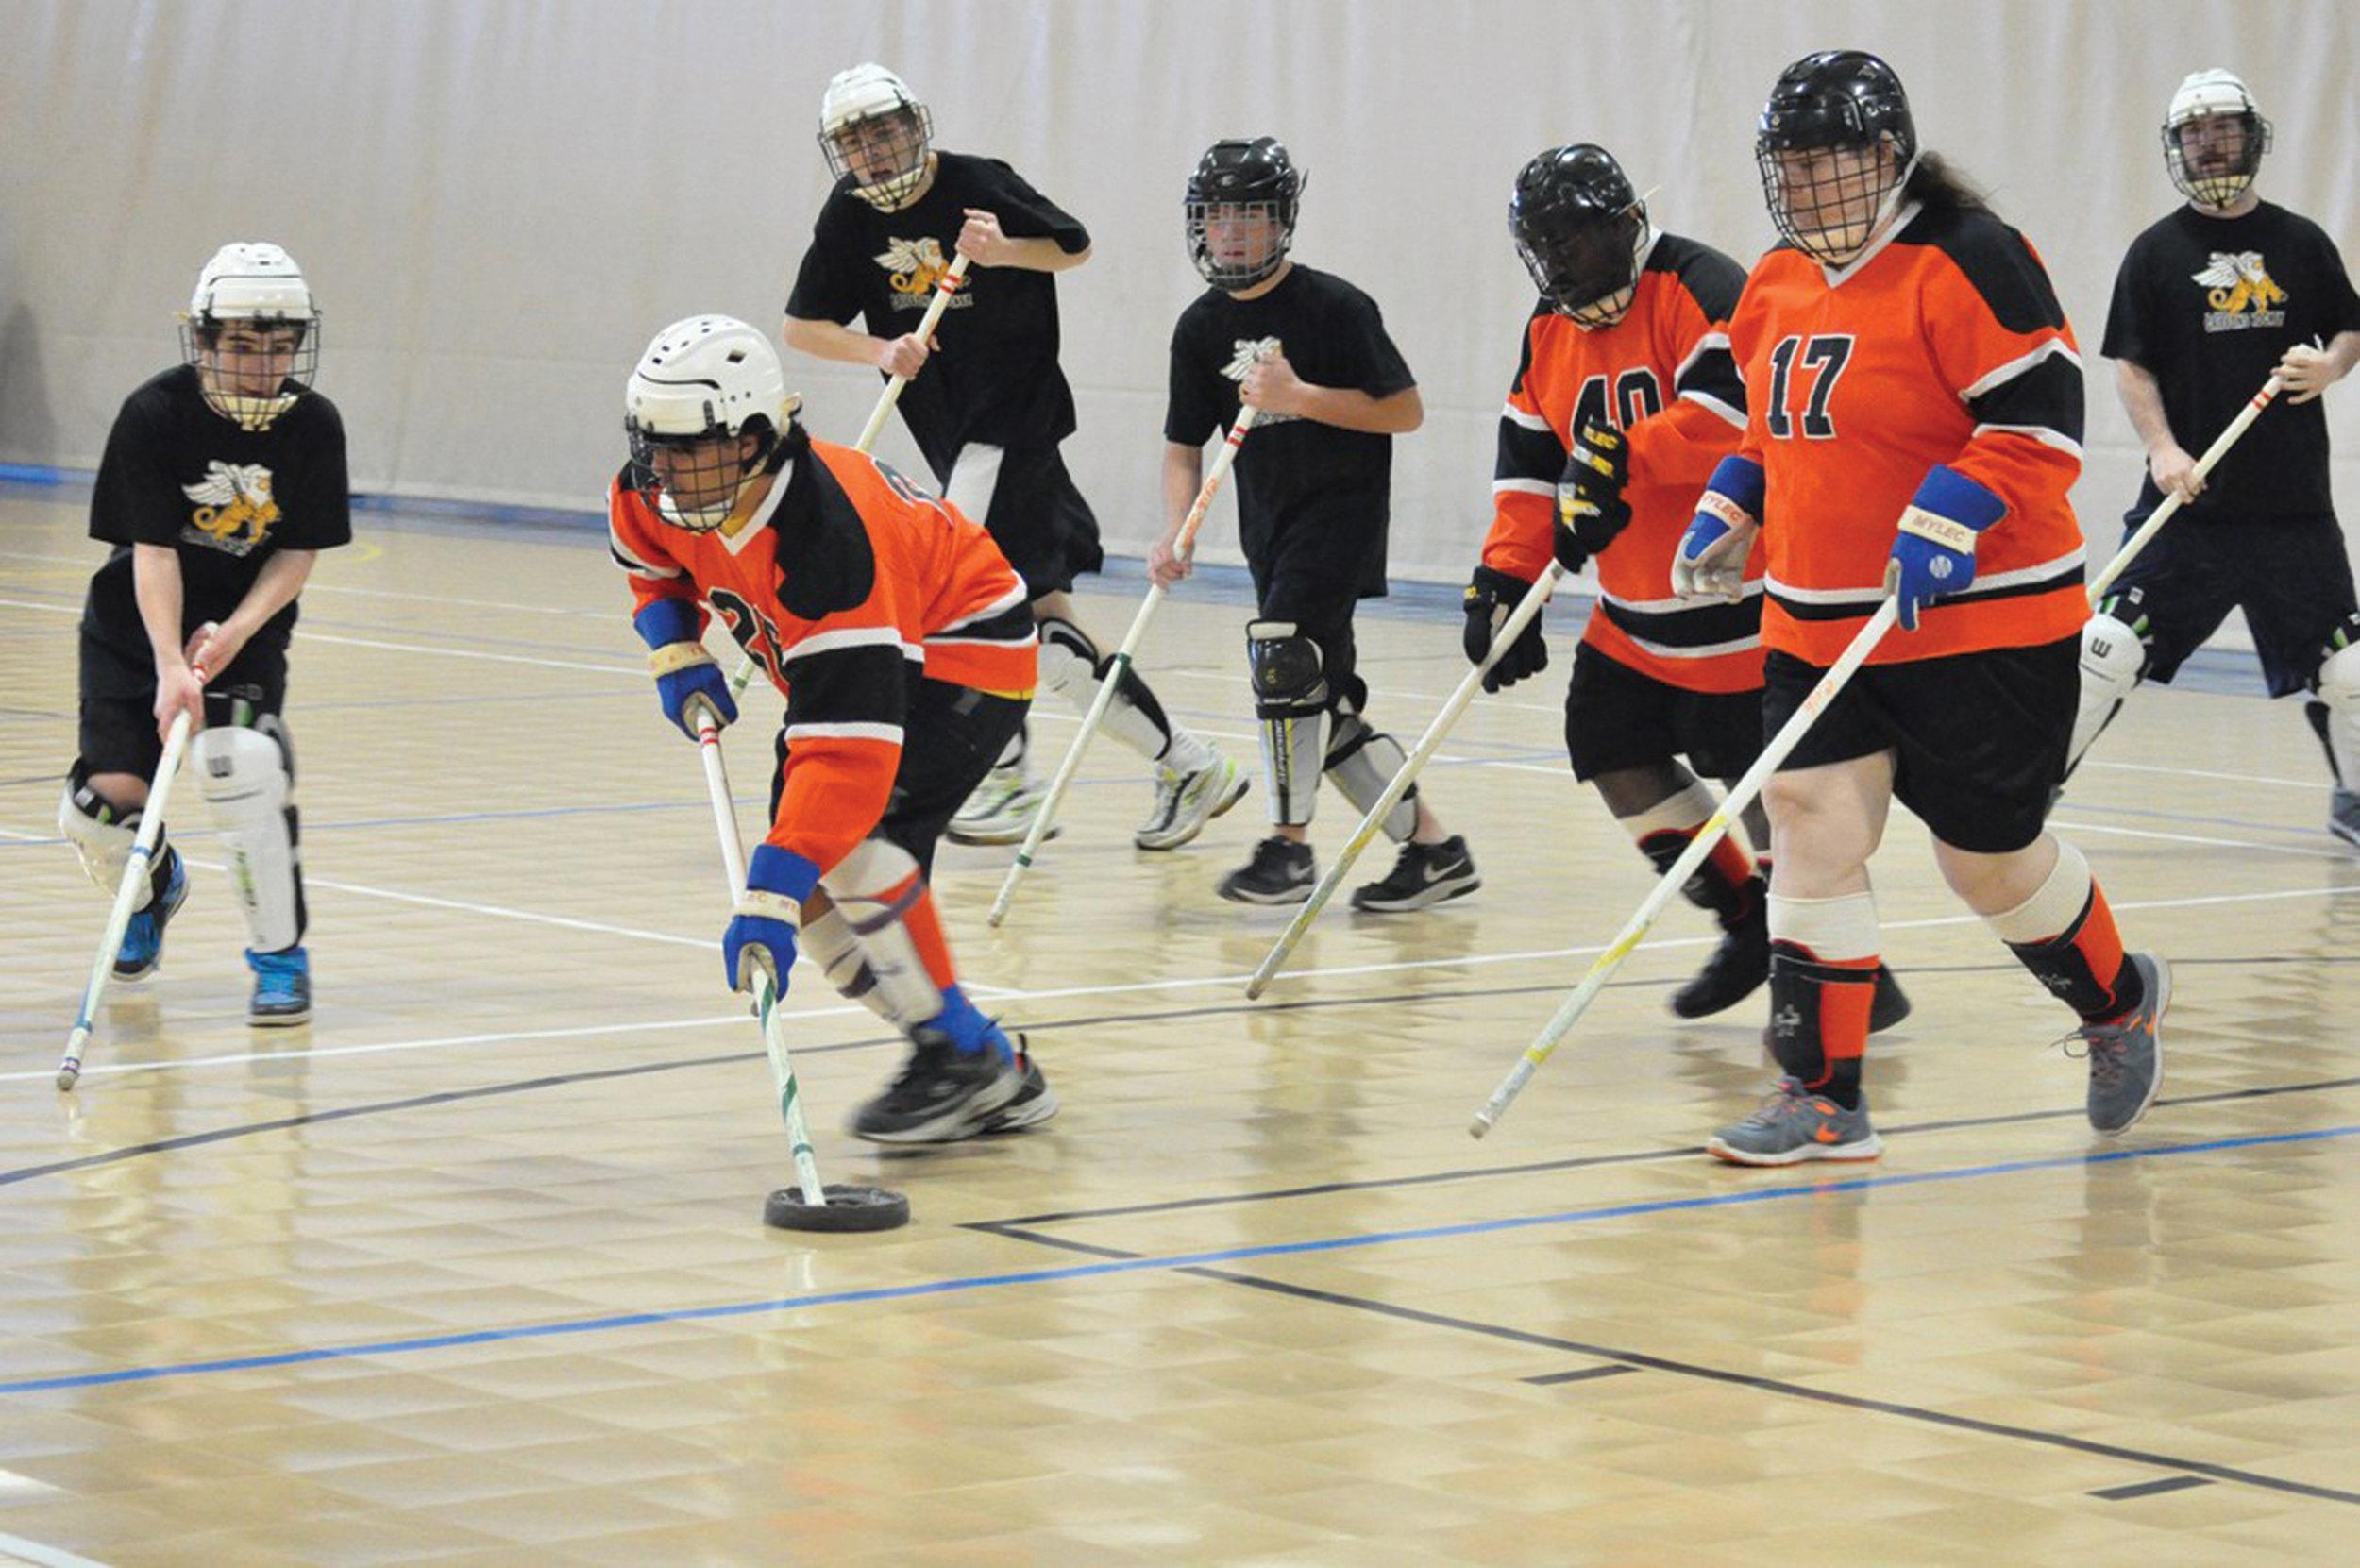 St. Joseph vs. Jackson County Parks & Rec in floor hockey at a tournament in Nebraska